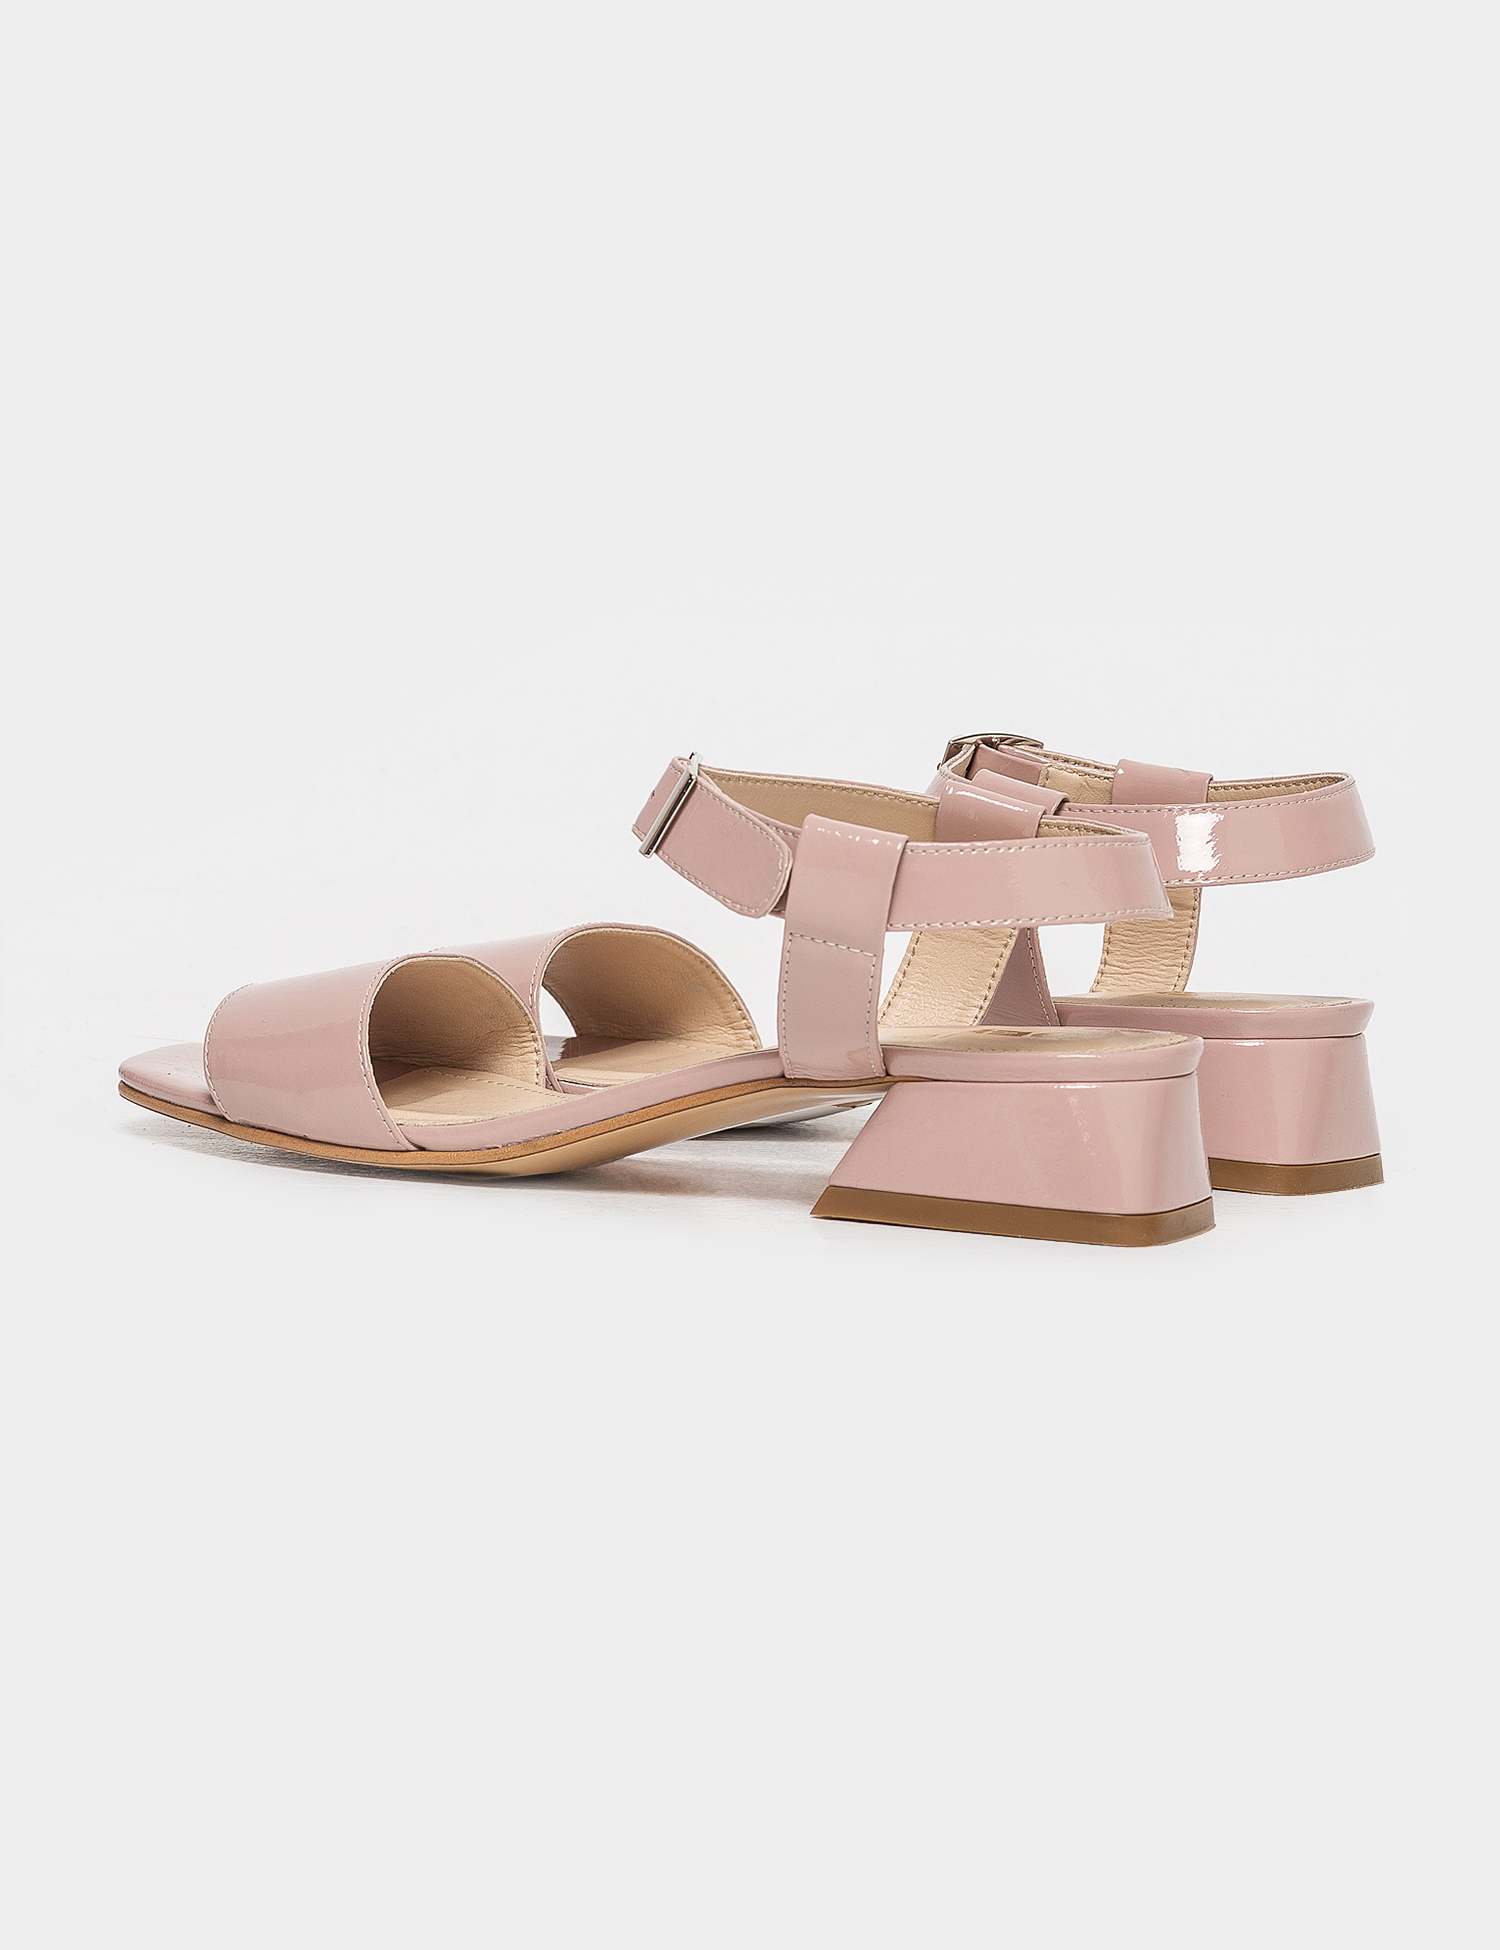 Босоніжки  для жінок Босоножек 96832010 розовая кожа лакированая 96832010 продаж, 2017